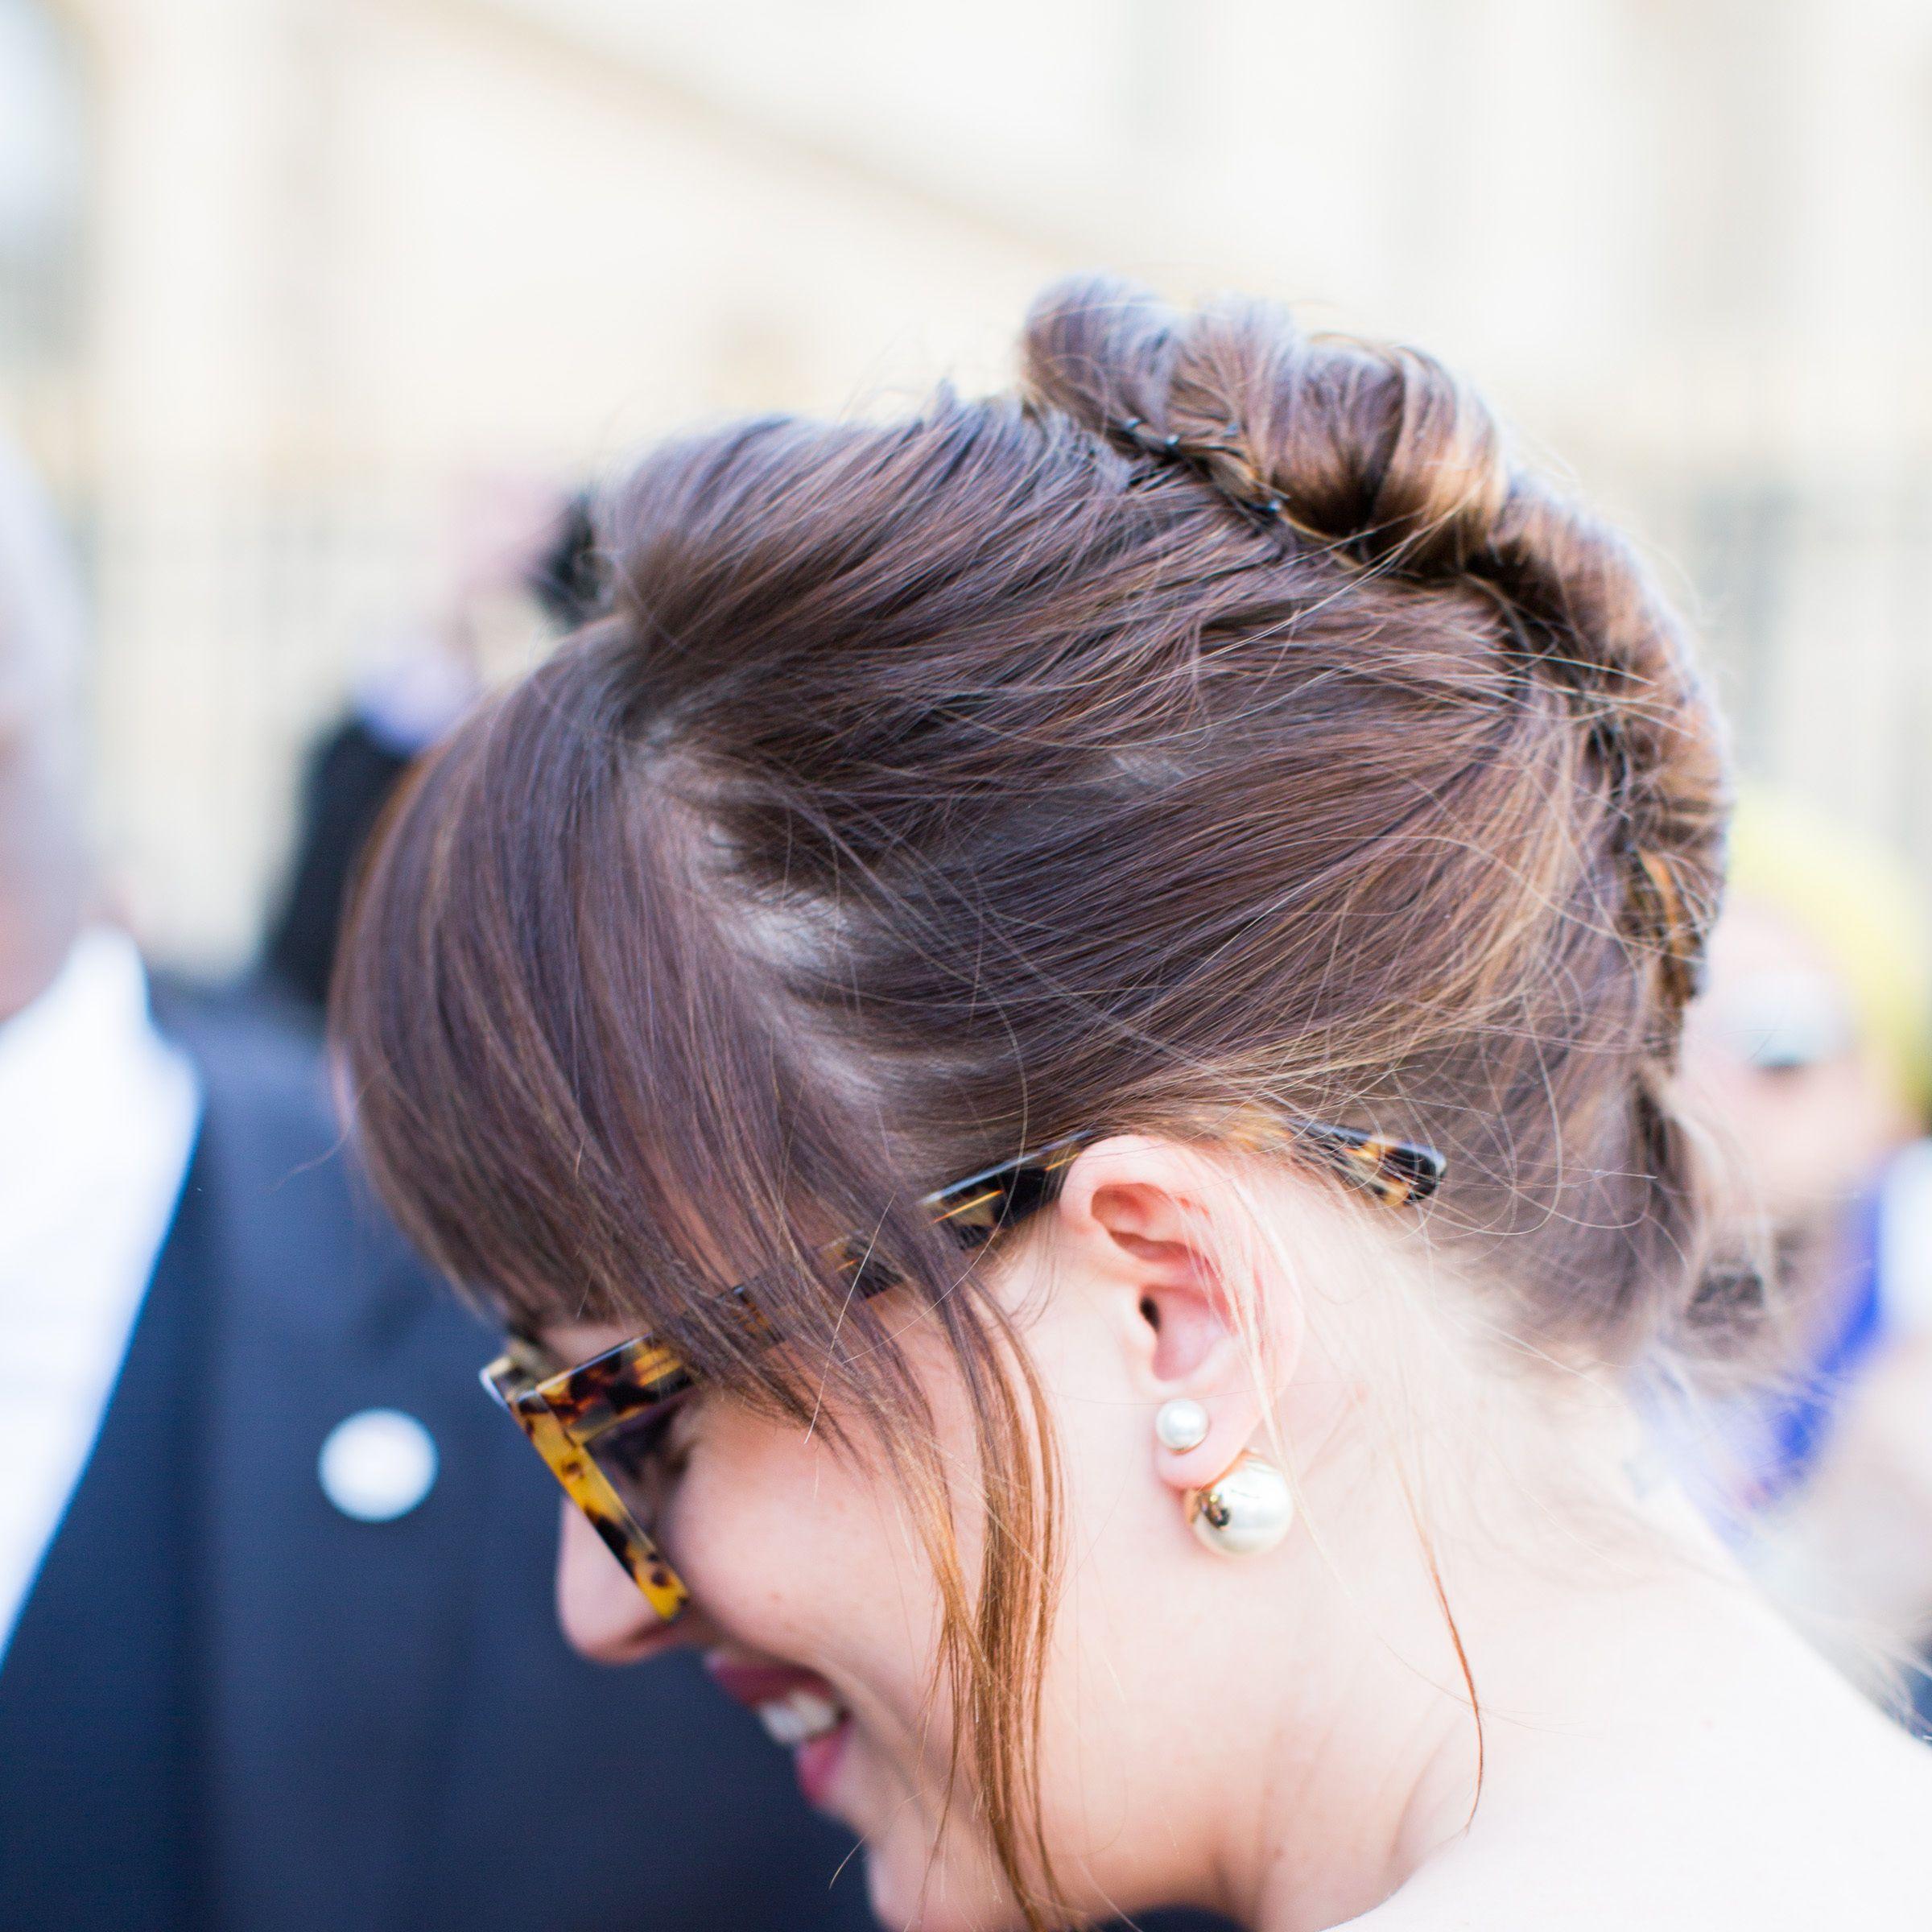 Dakota Johnson, Street Style-mosphere